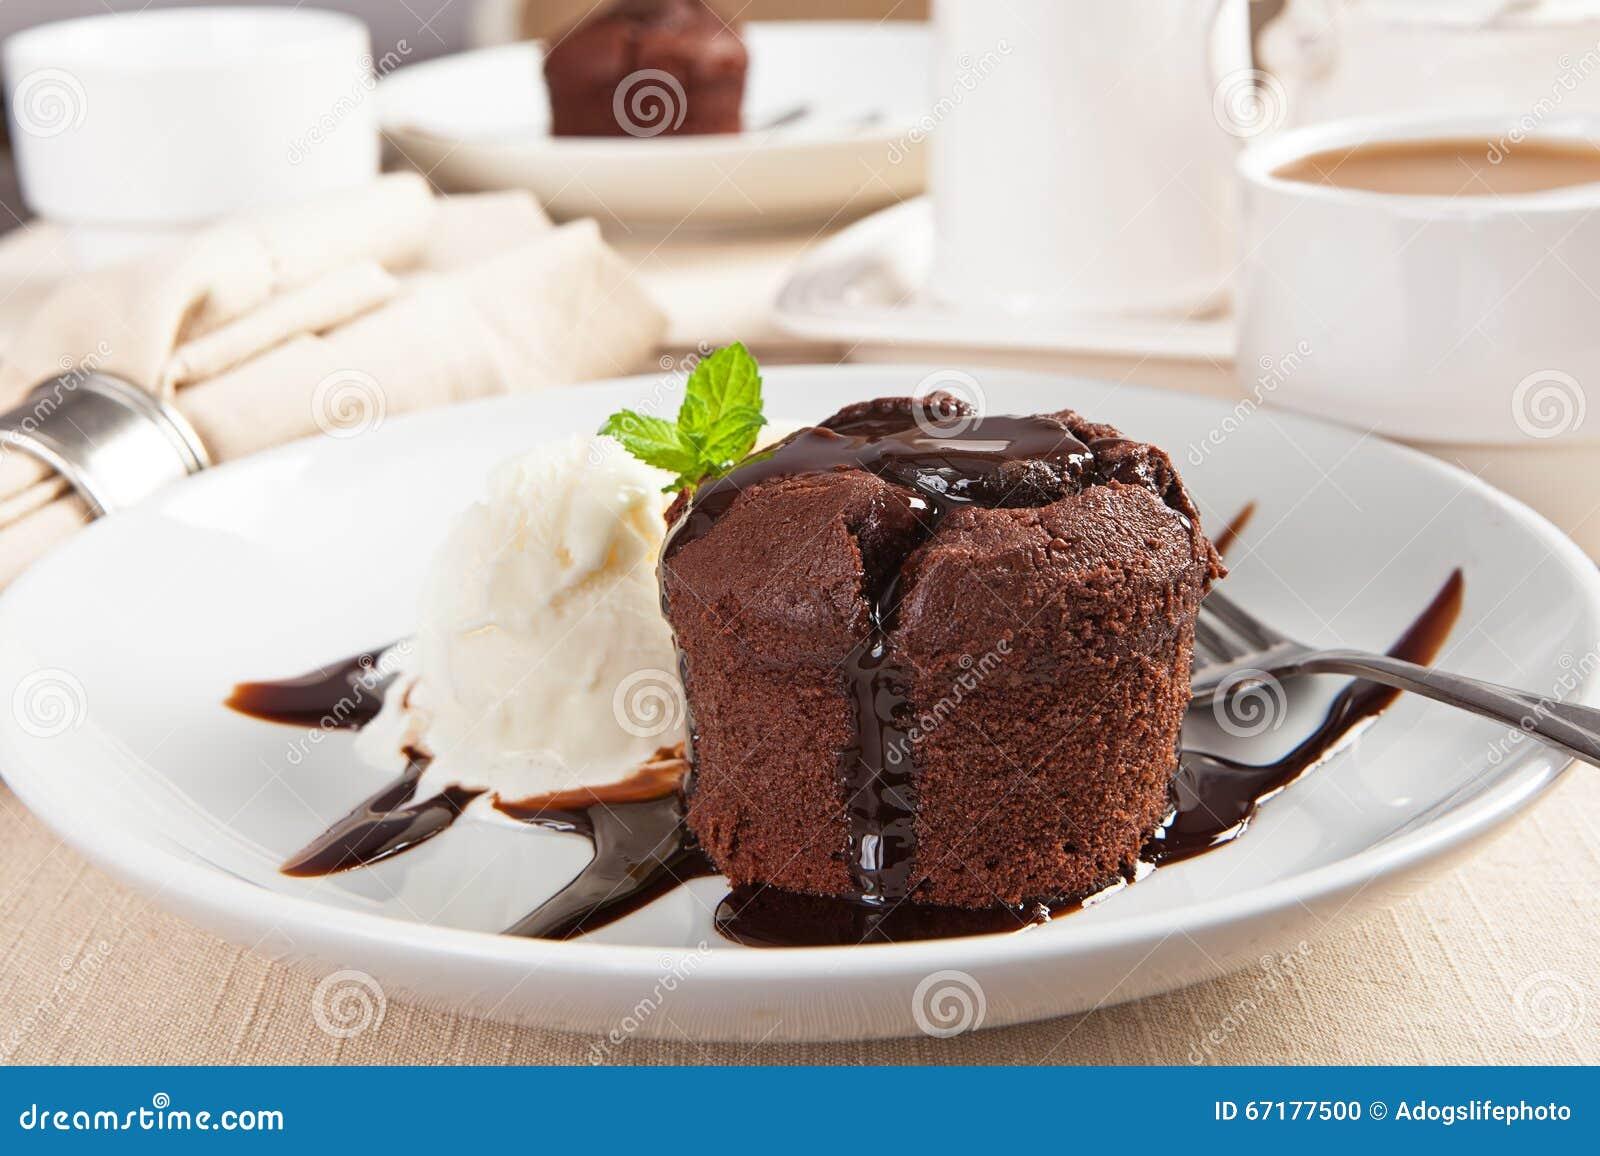 Chocolate Lava Cake With Ice Cream Stock Photo Image Of